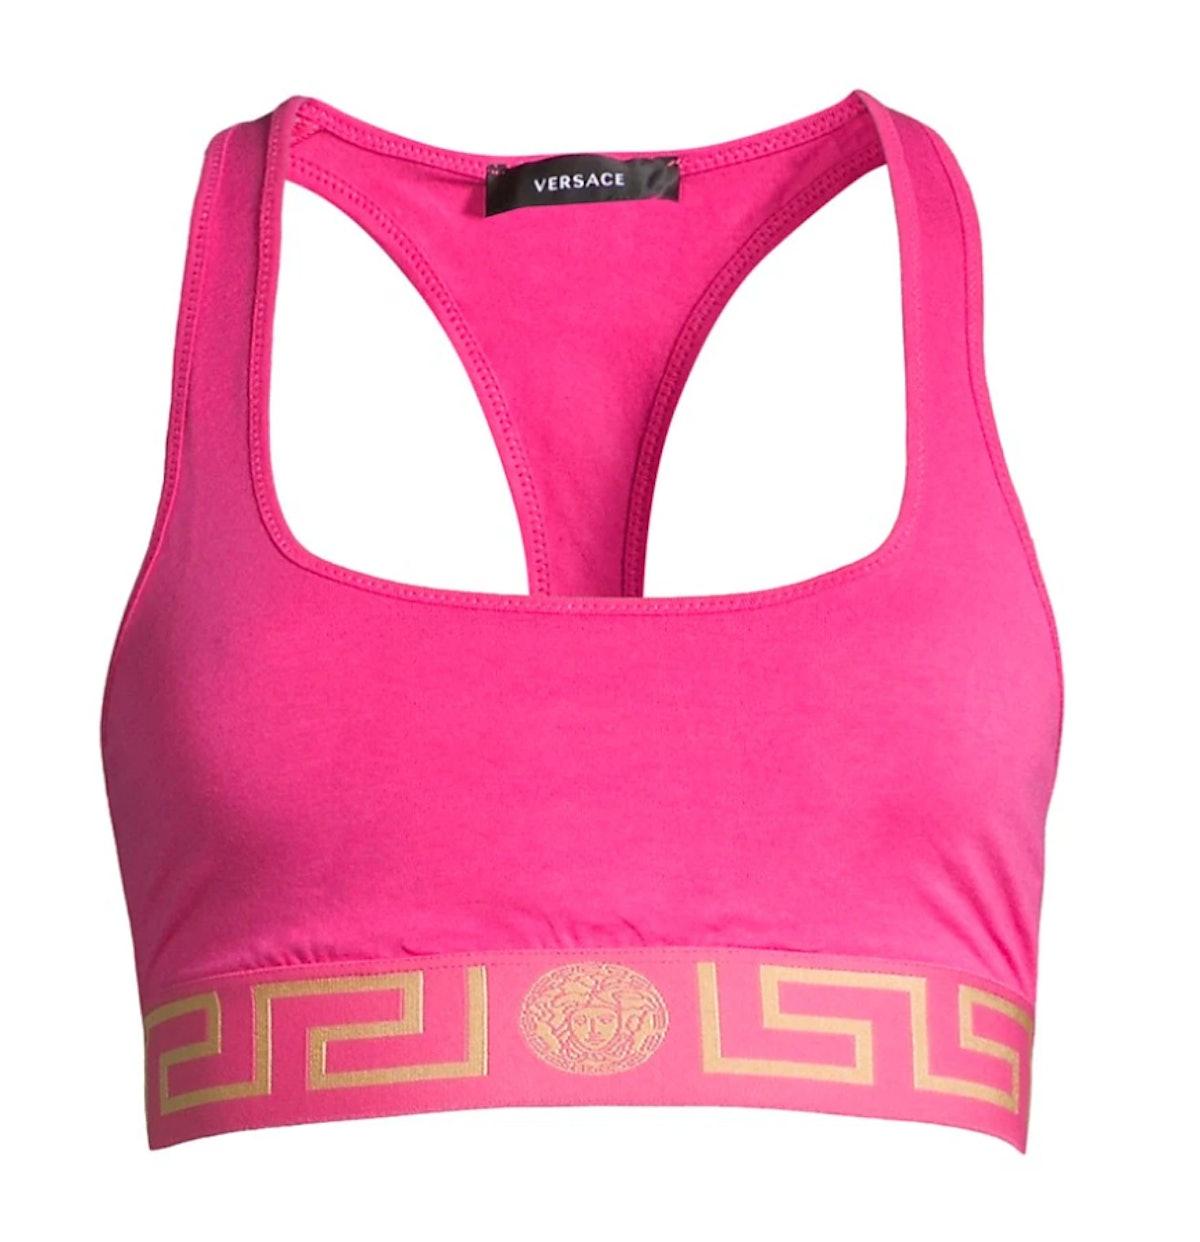 Versace's hot pink Greca sports bra.